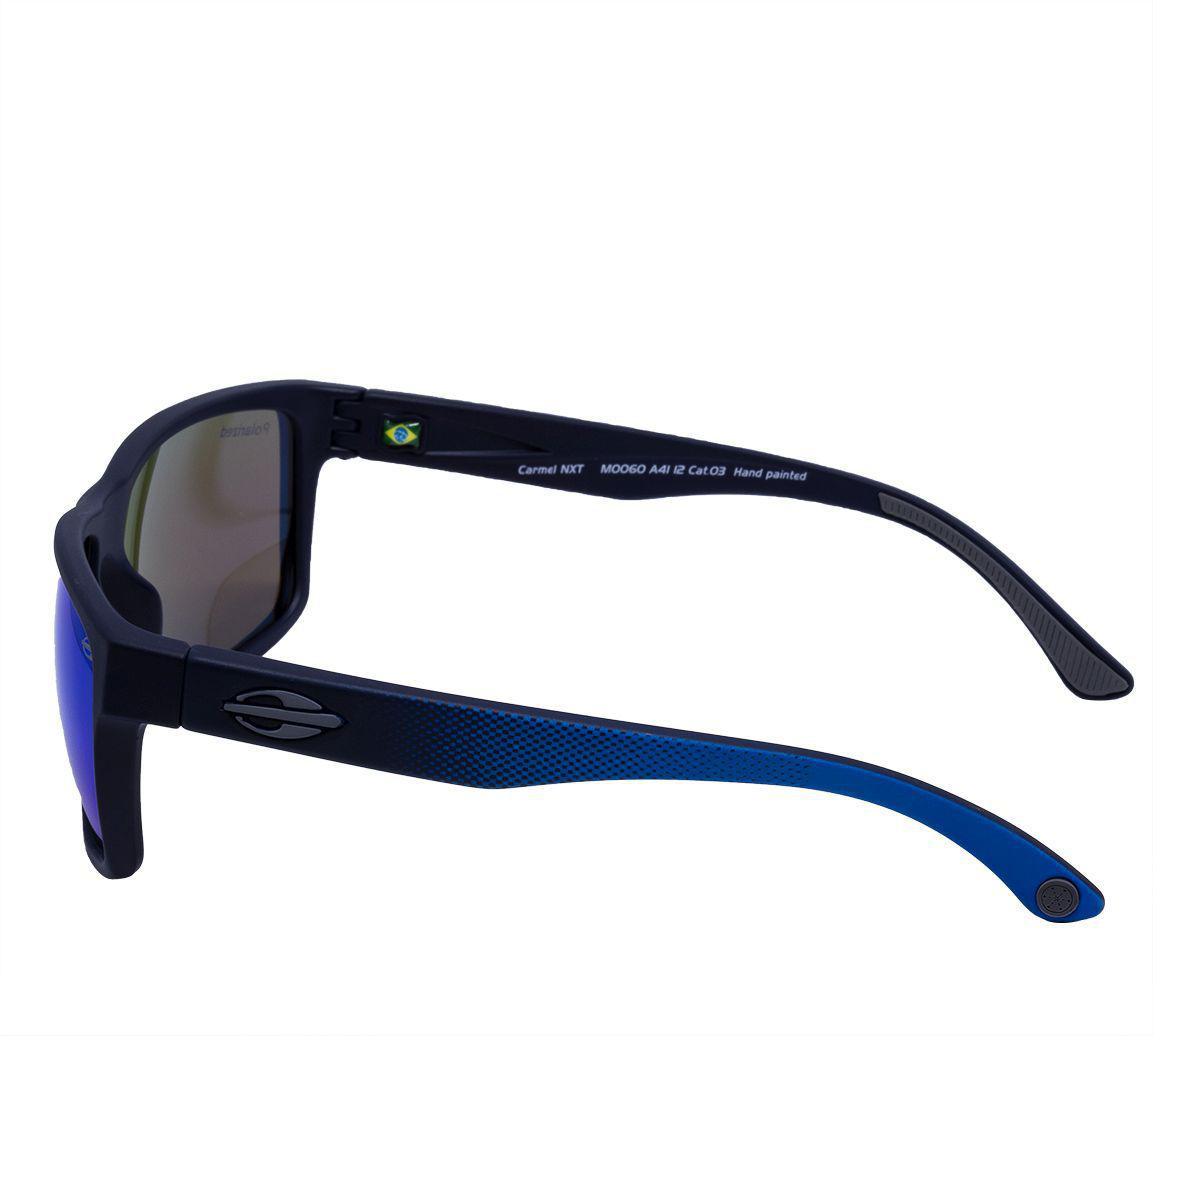 ffa4345da3a82 Óculos de Sol Mormaii Infantil Monterey NXT M0060 A41 - Acetato Azul ...